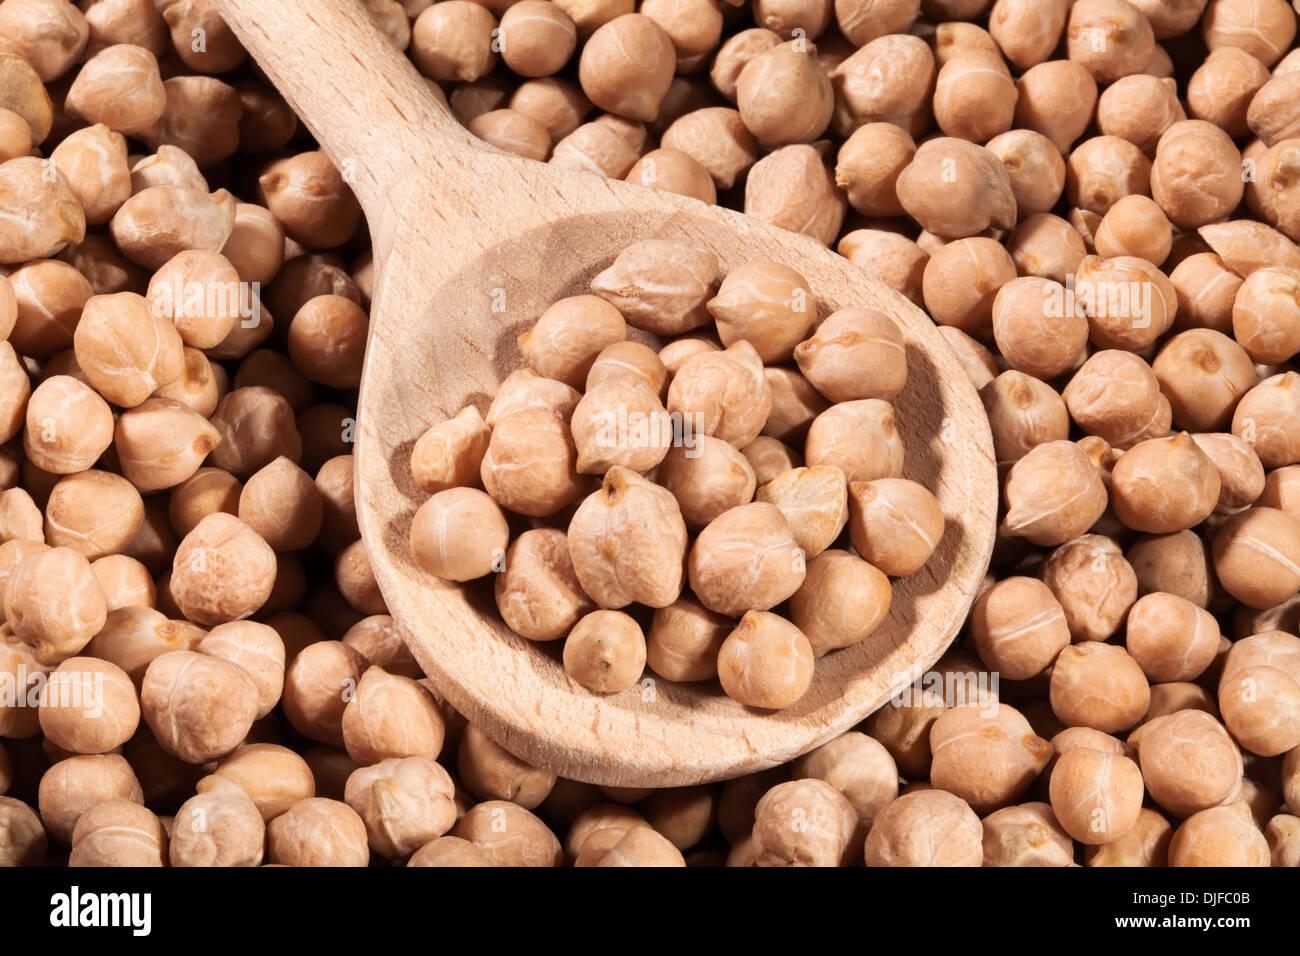 peas seeds closeup spoon wooden - Stock Image